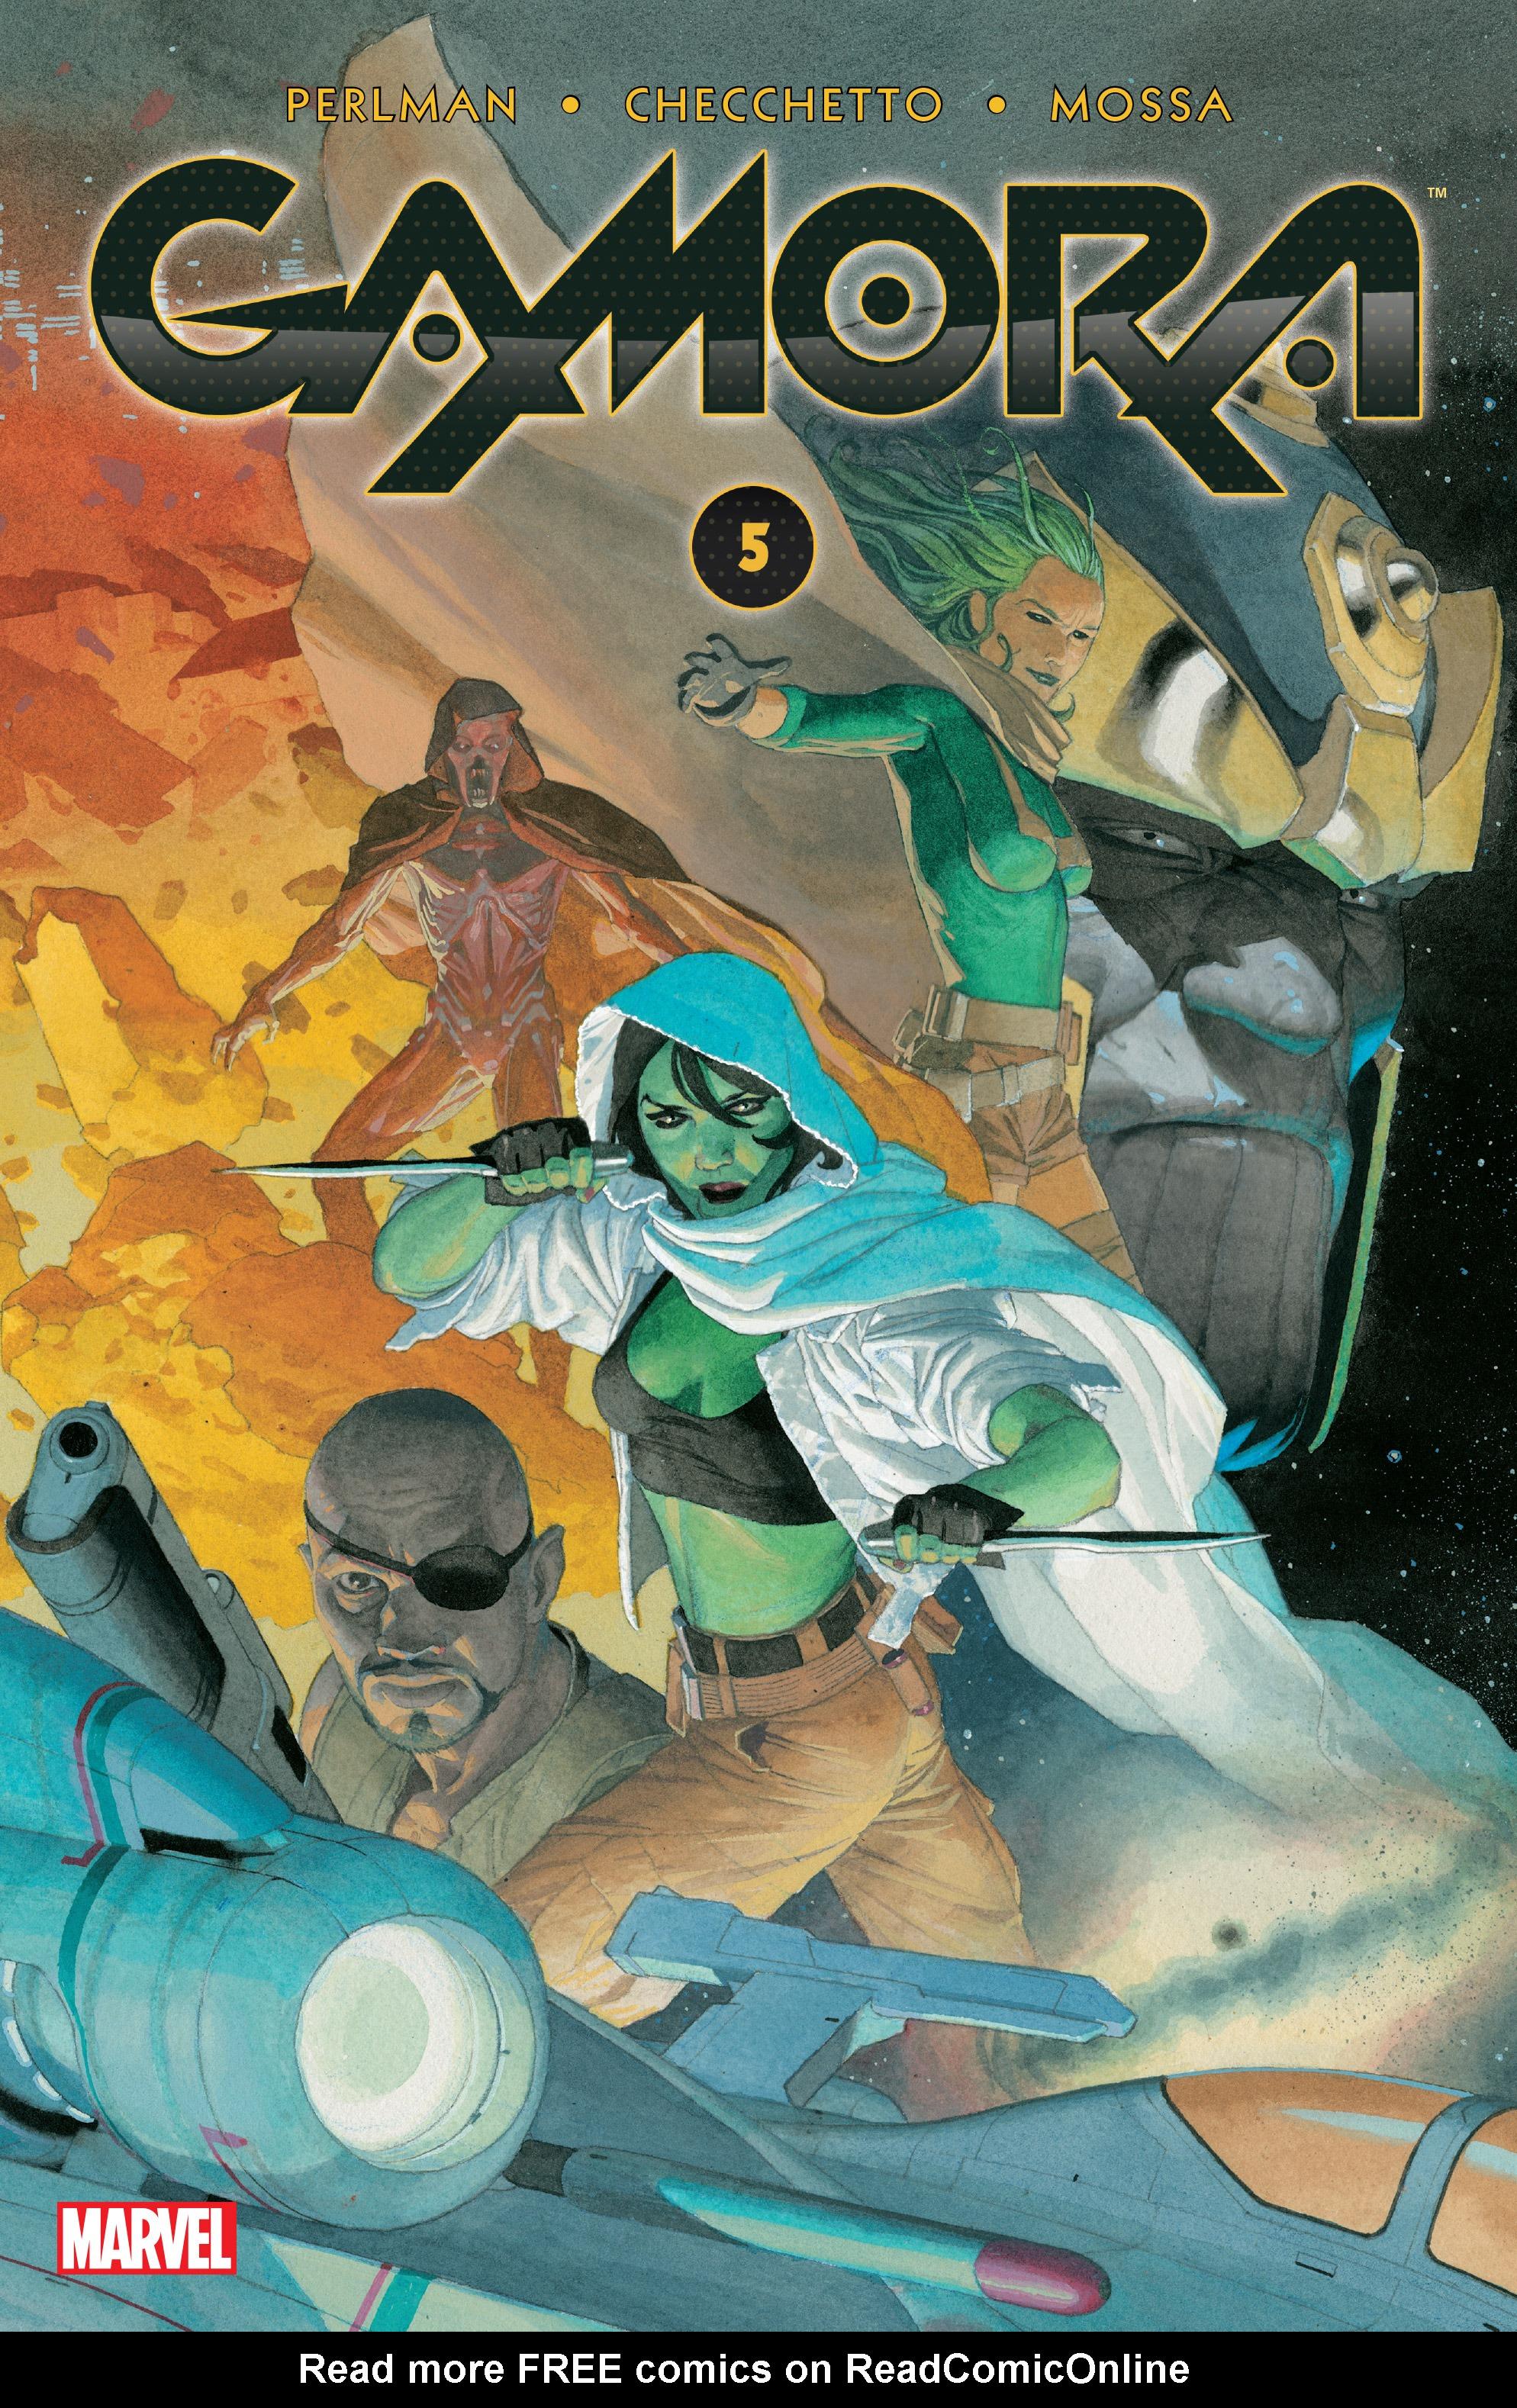 Read online Gamora comic -  Issue #5 - 1